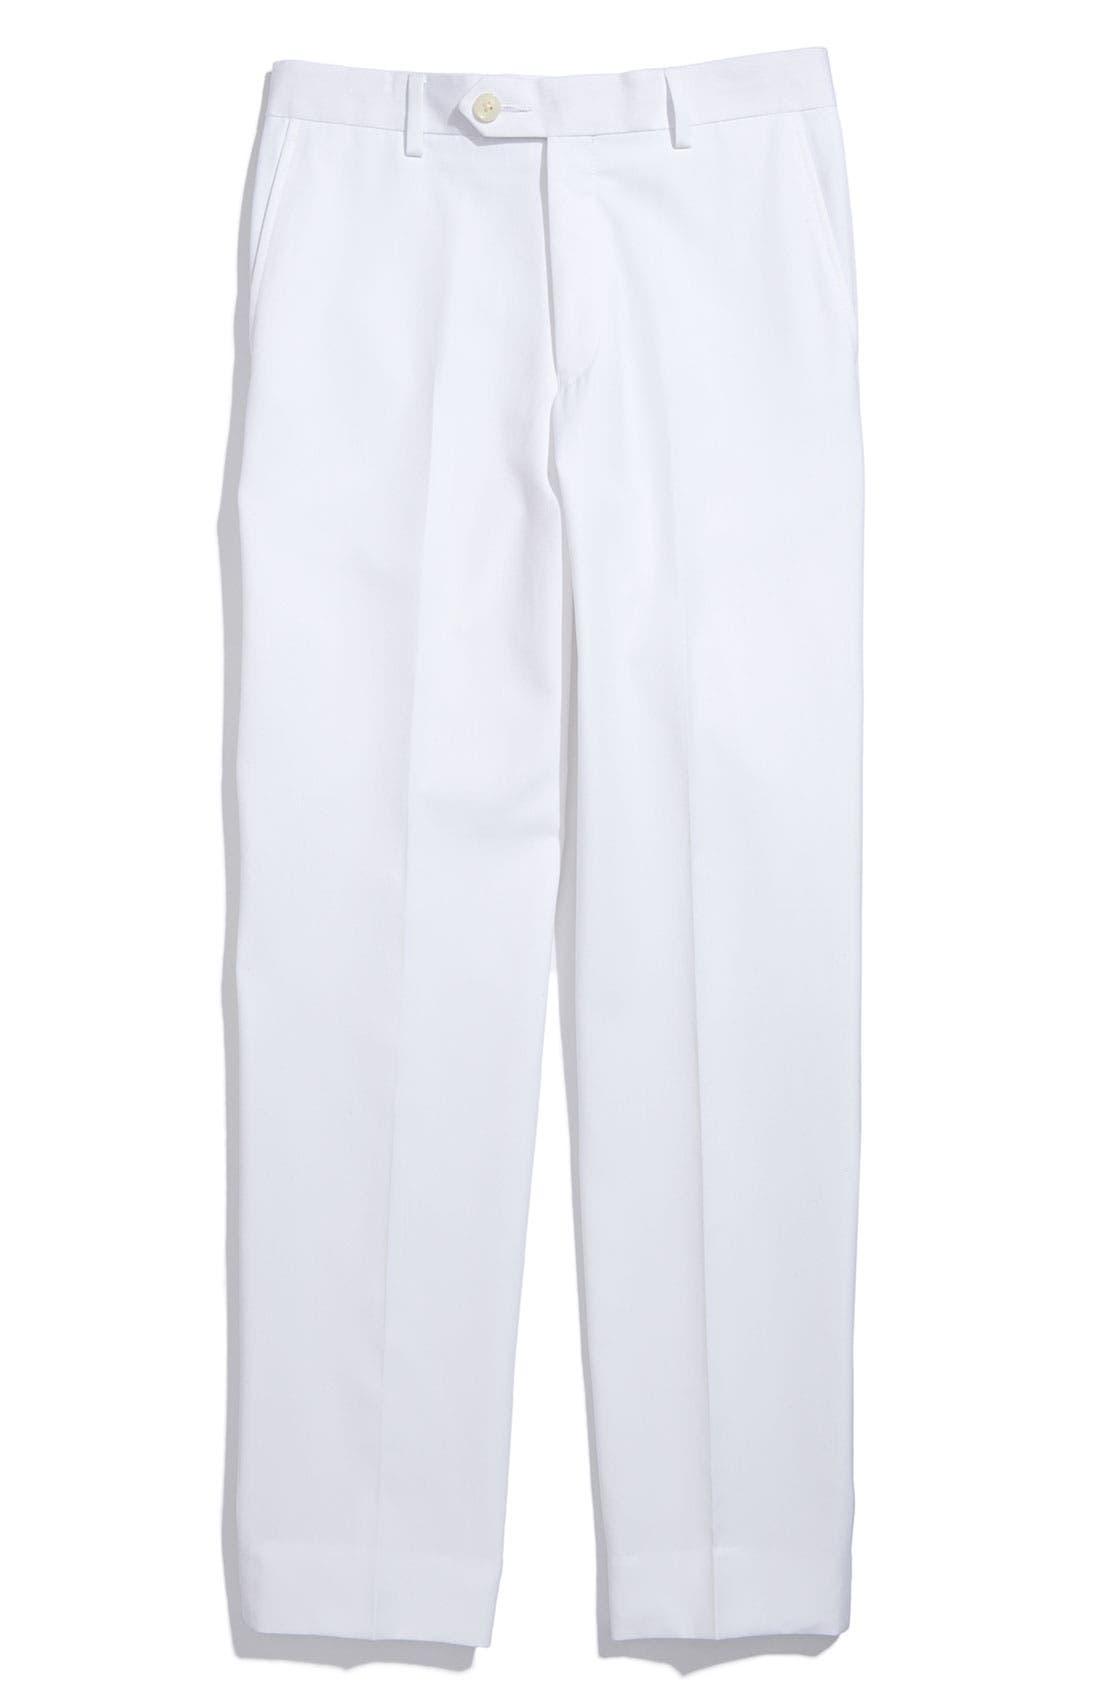 Main Image - Joseph Abboud Flat Front Dress Pants (Little Boys, Big Boys & Husky)